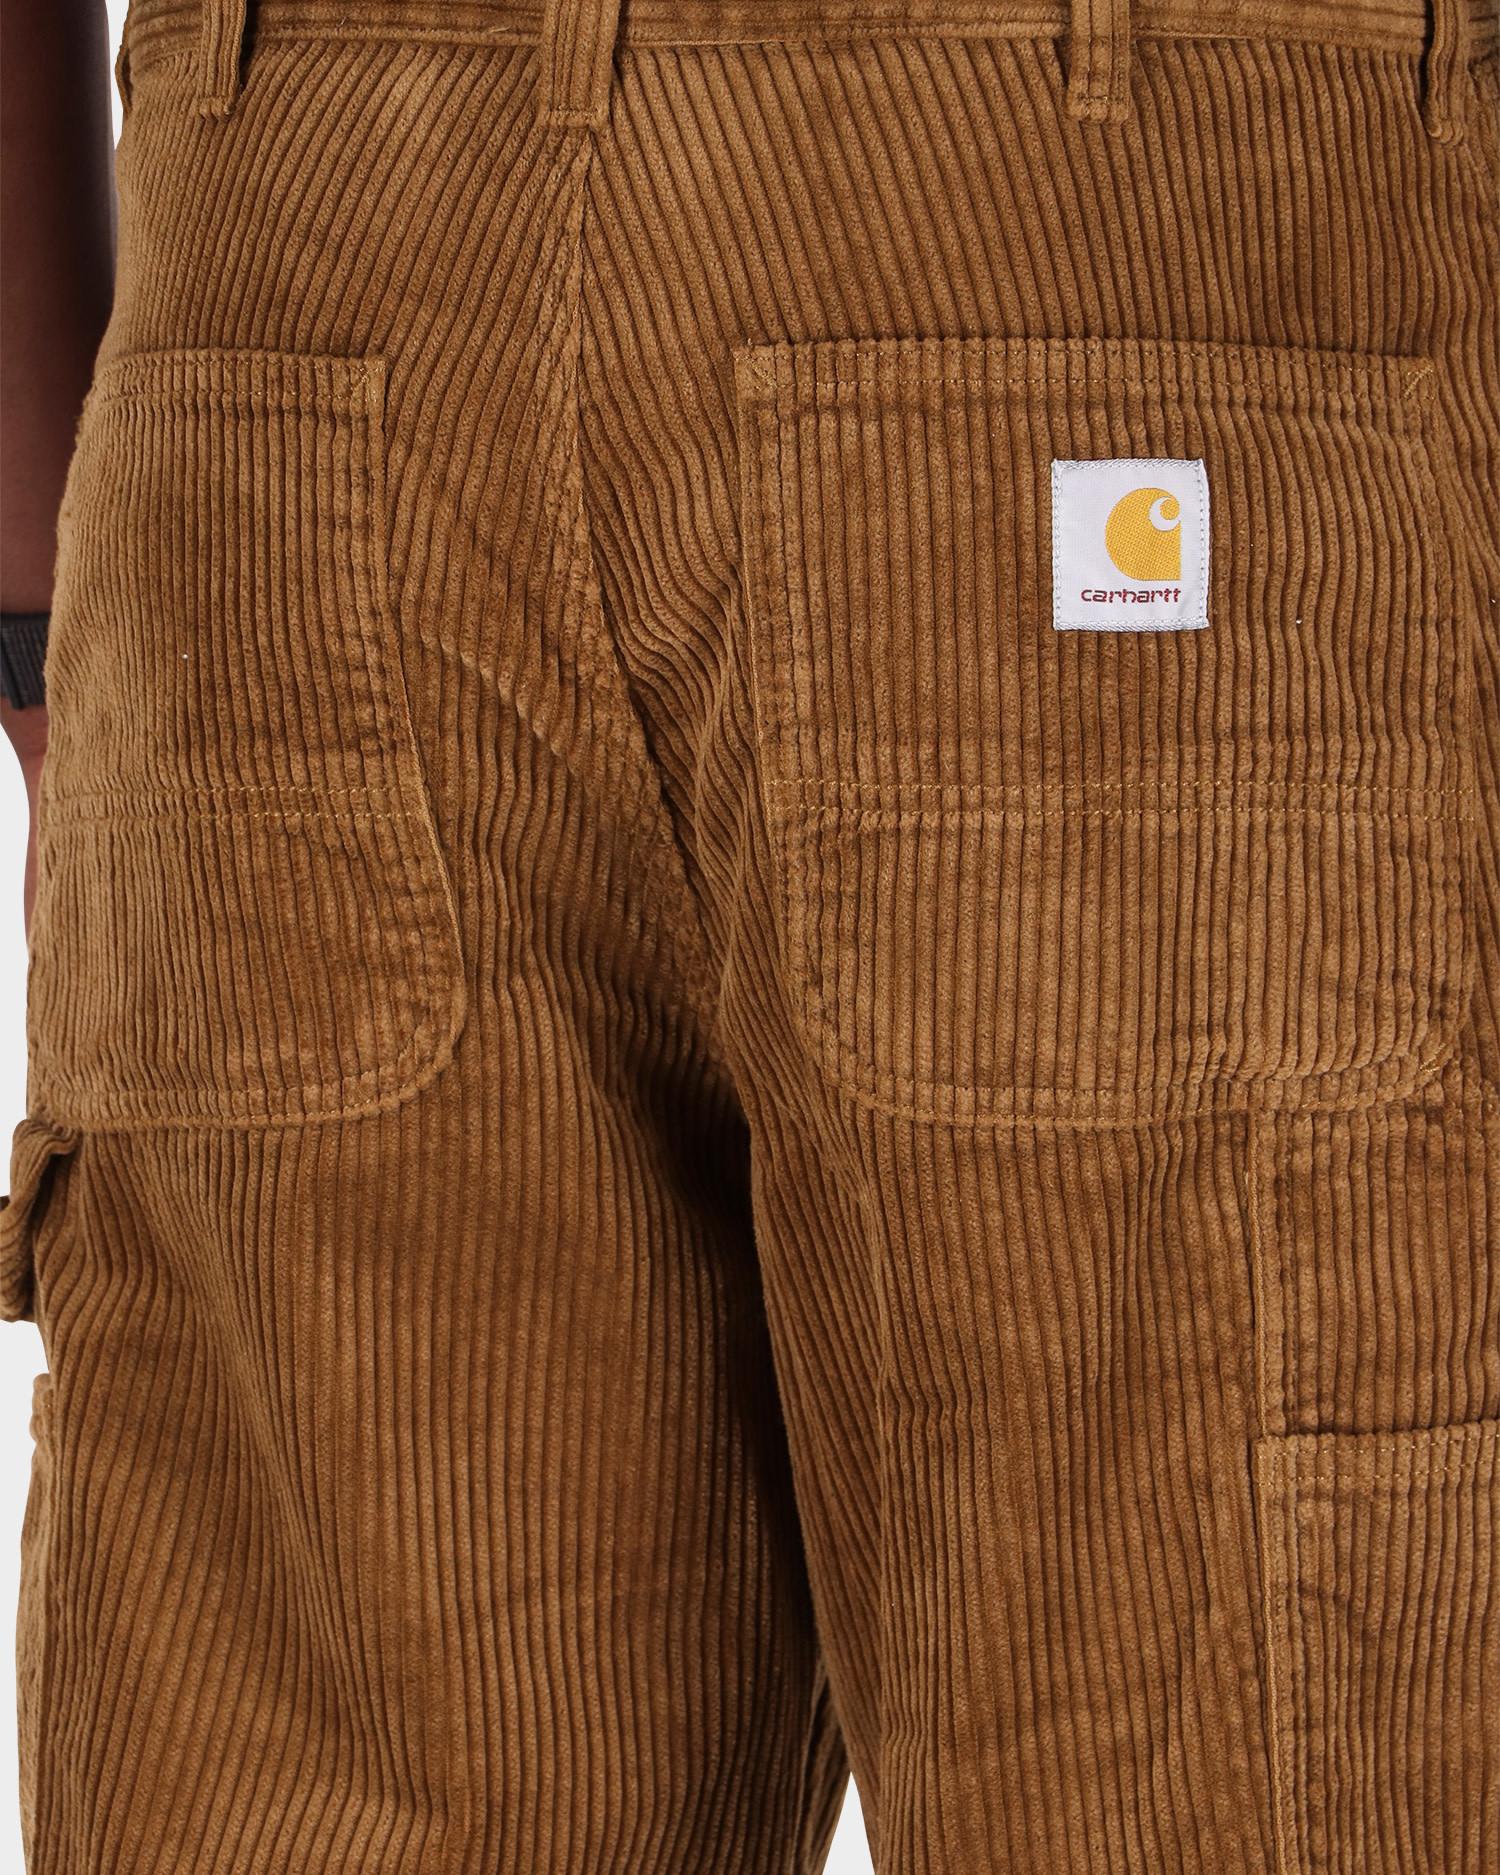 Carhartt Single Knee Pant Hamilton Brown rinsed